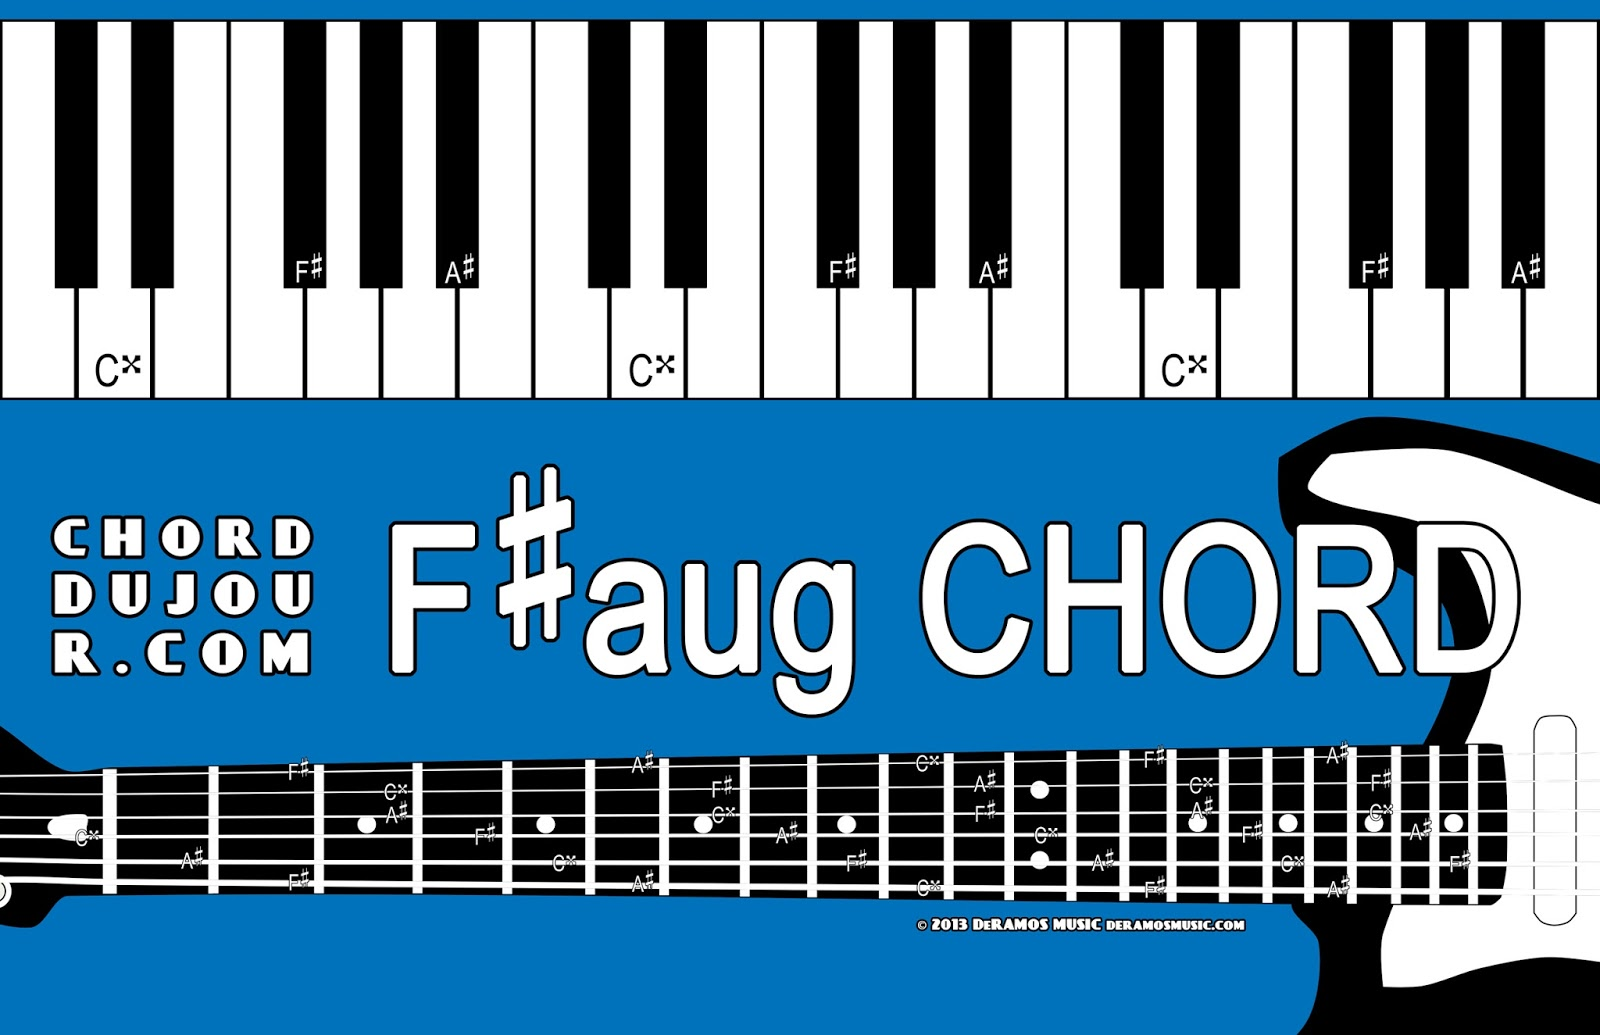 Chord Du Jour Dictionary Faug Chord